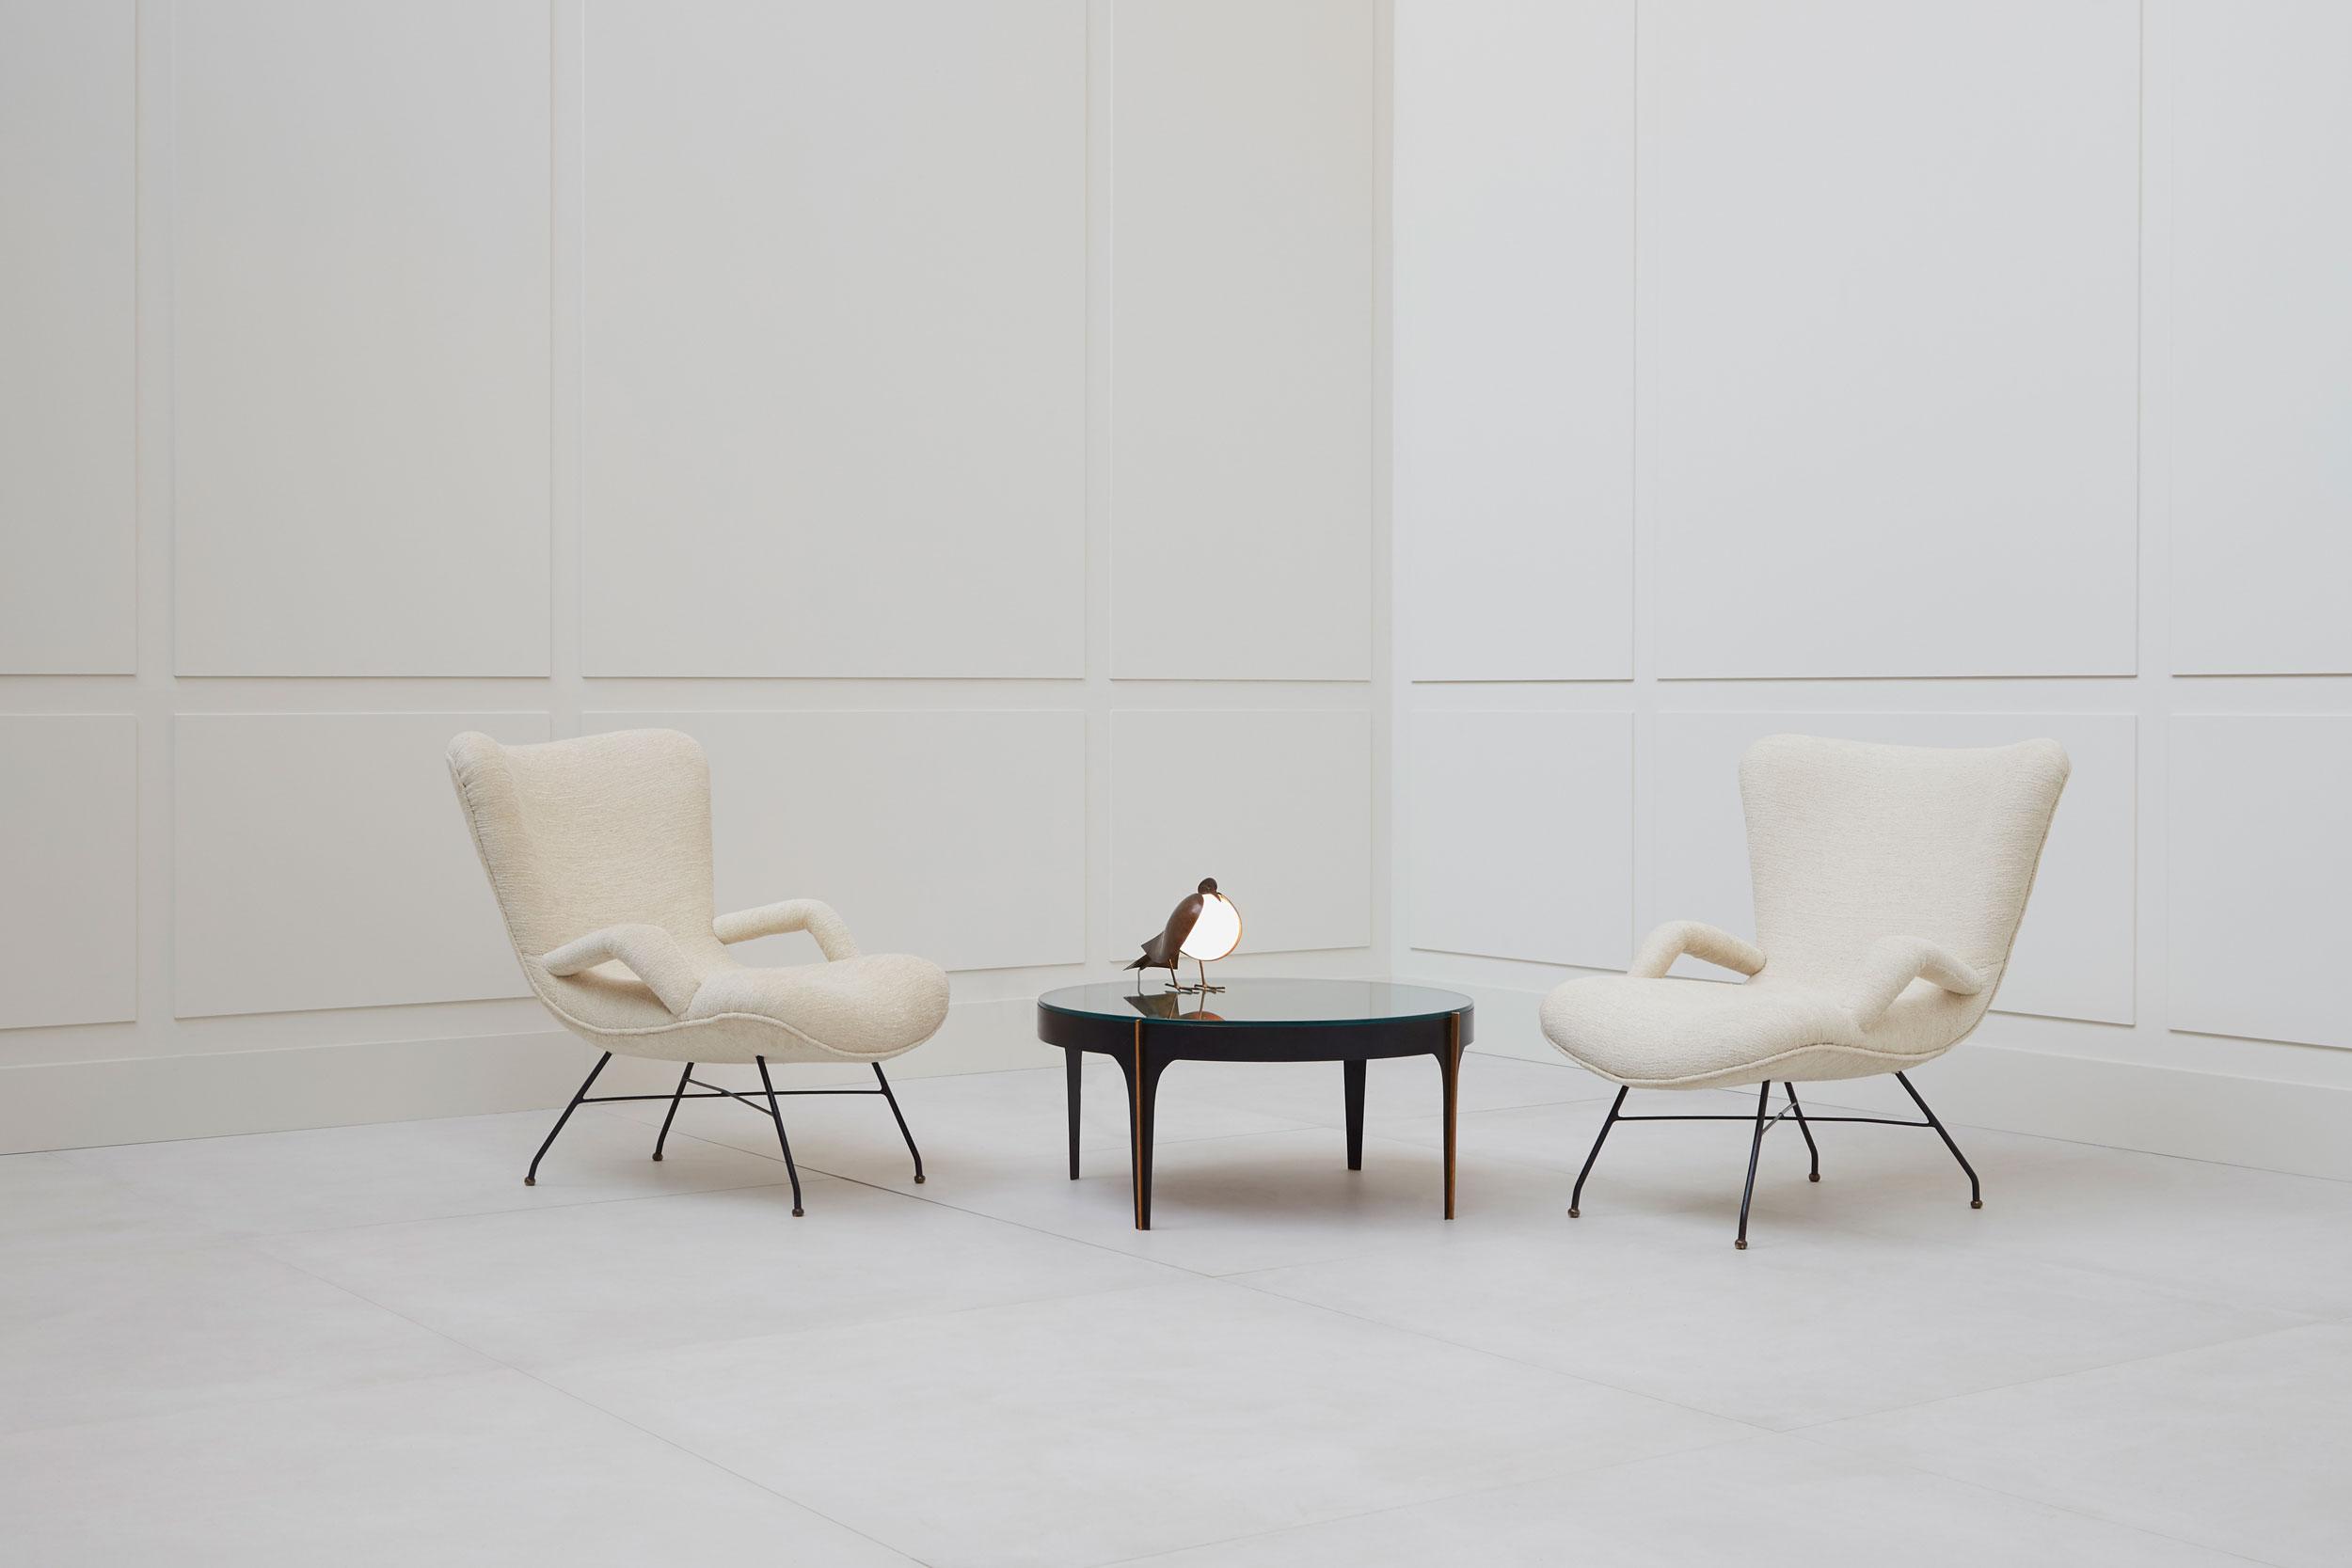 Max Ingrand & Fontana Arte, Table basse modèle 1774, vue 02